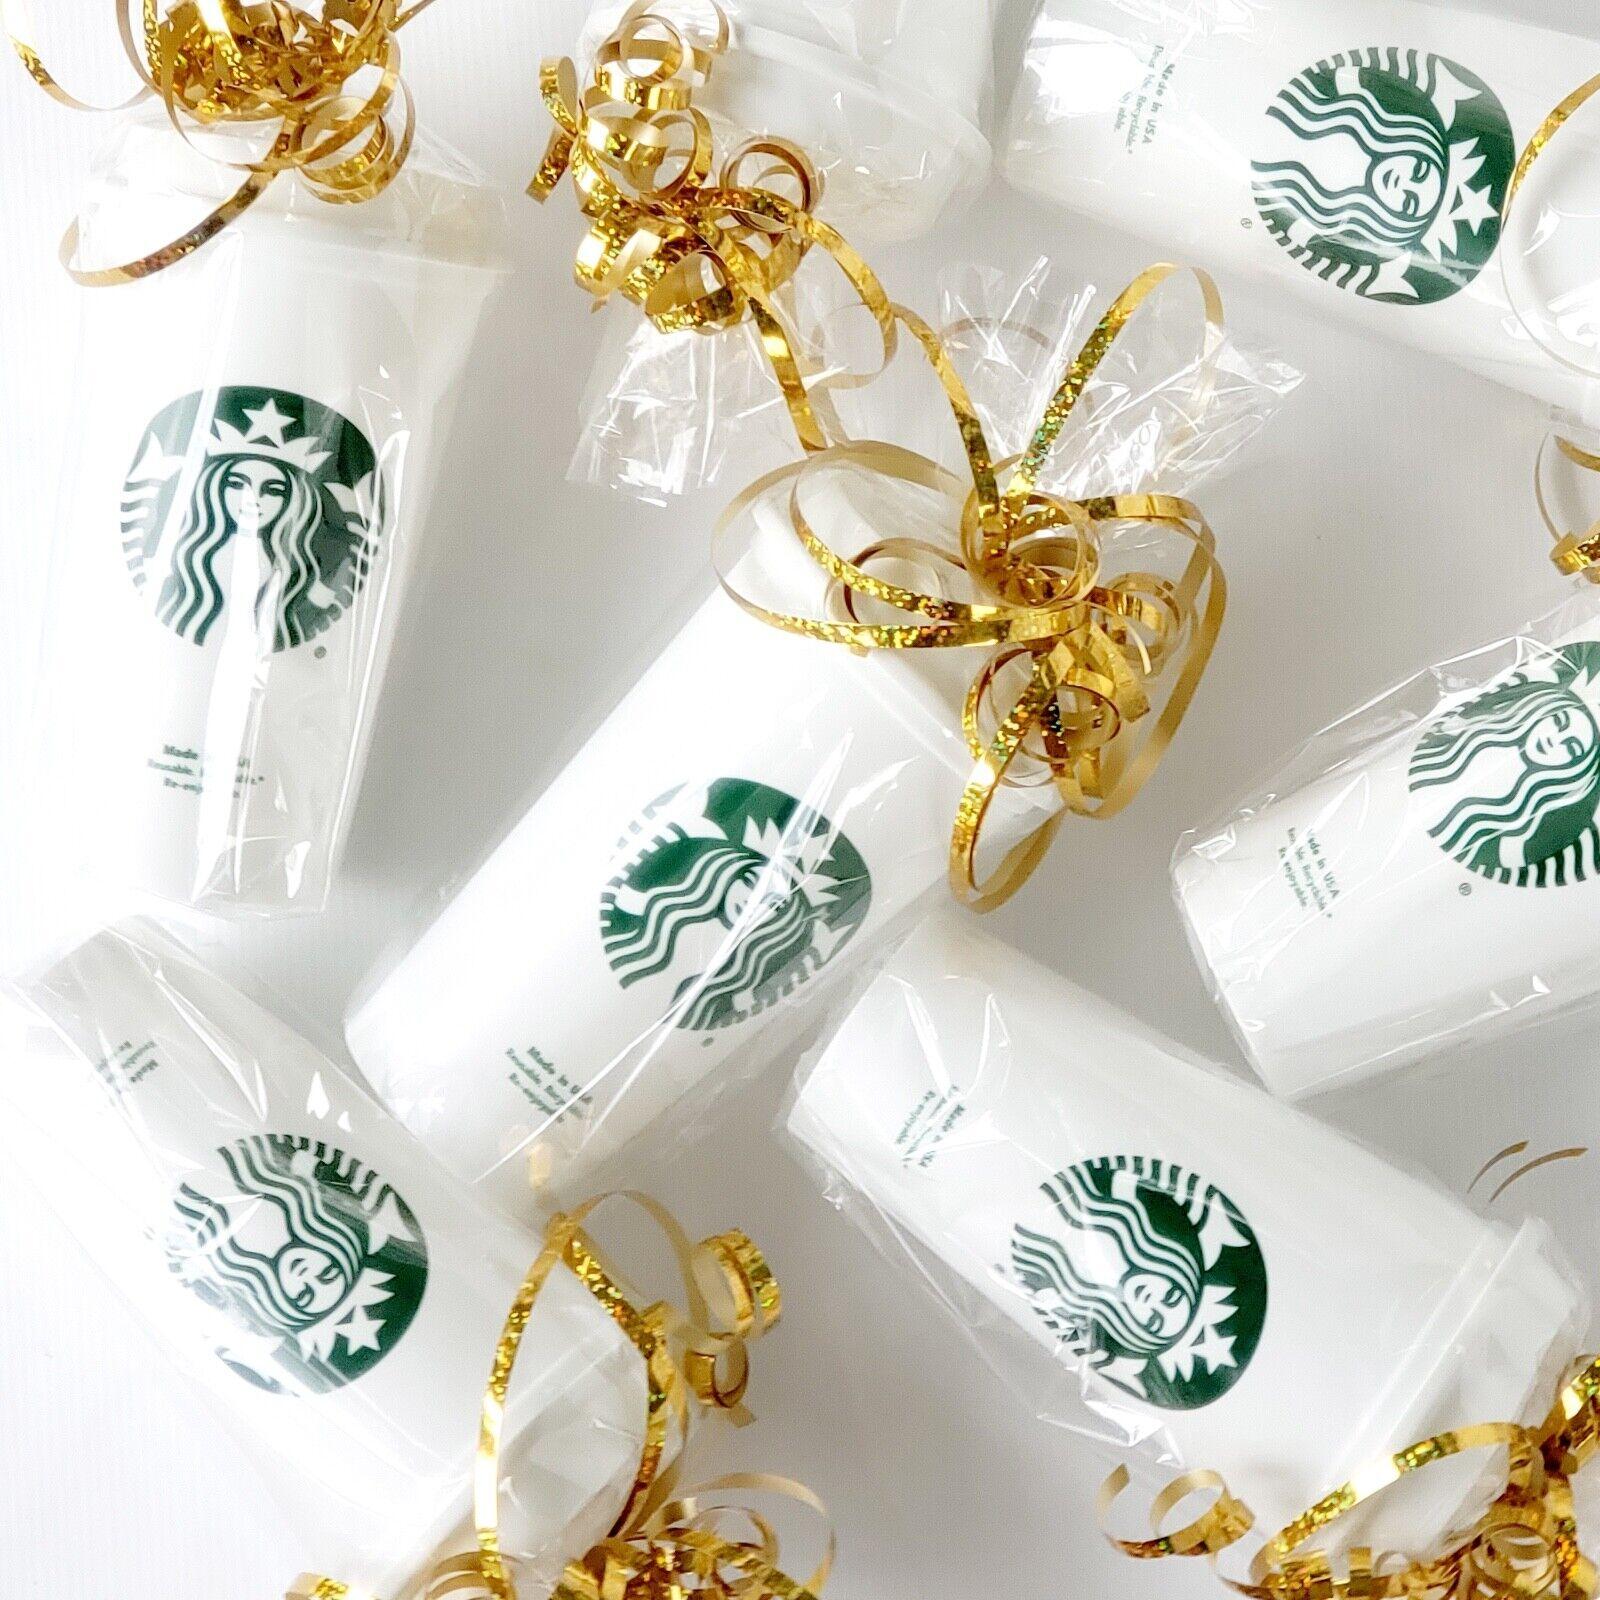 Starbucks Via Coffee & Reusable Cup - Ready to Give Gift Set